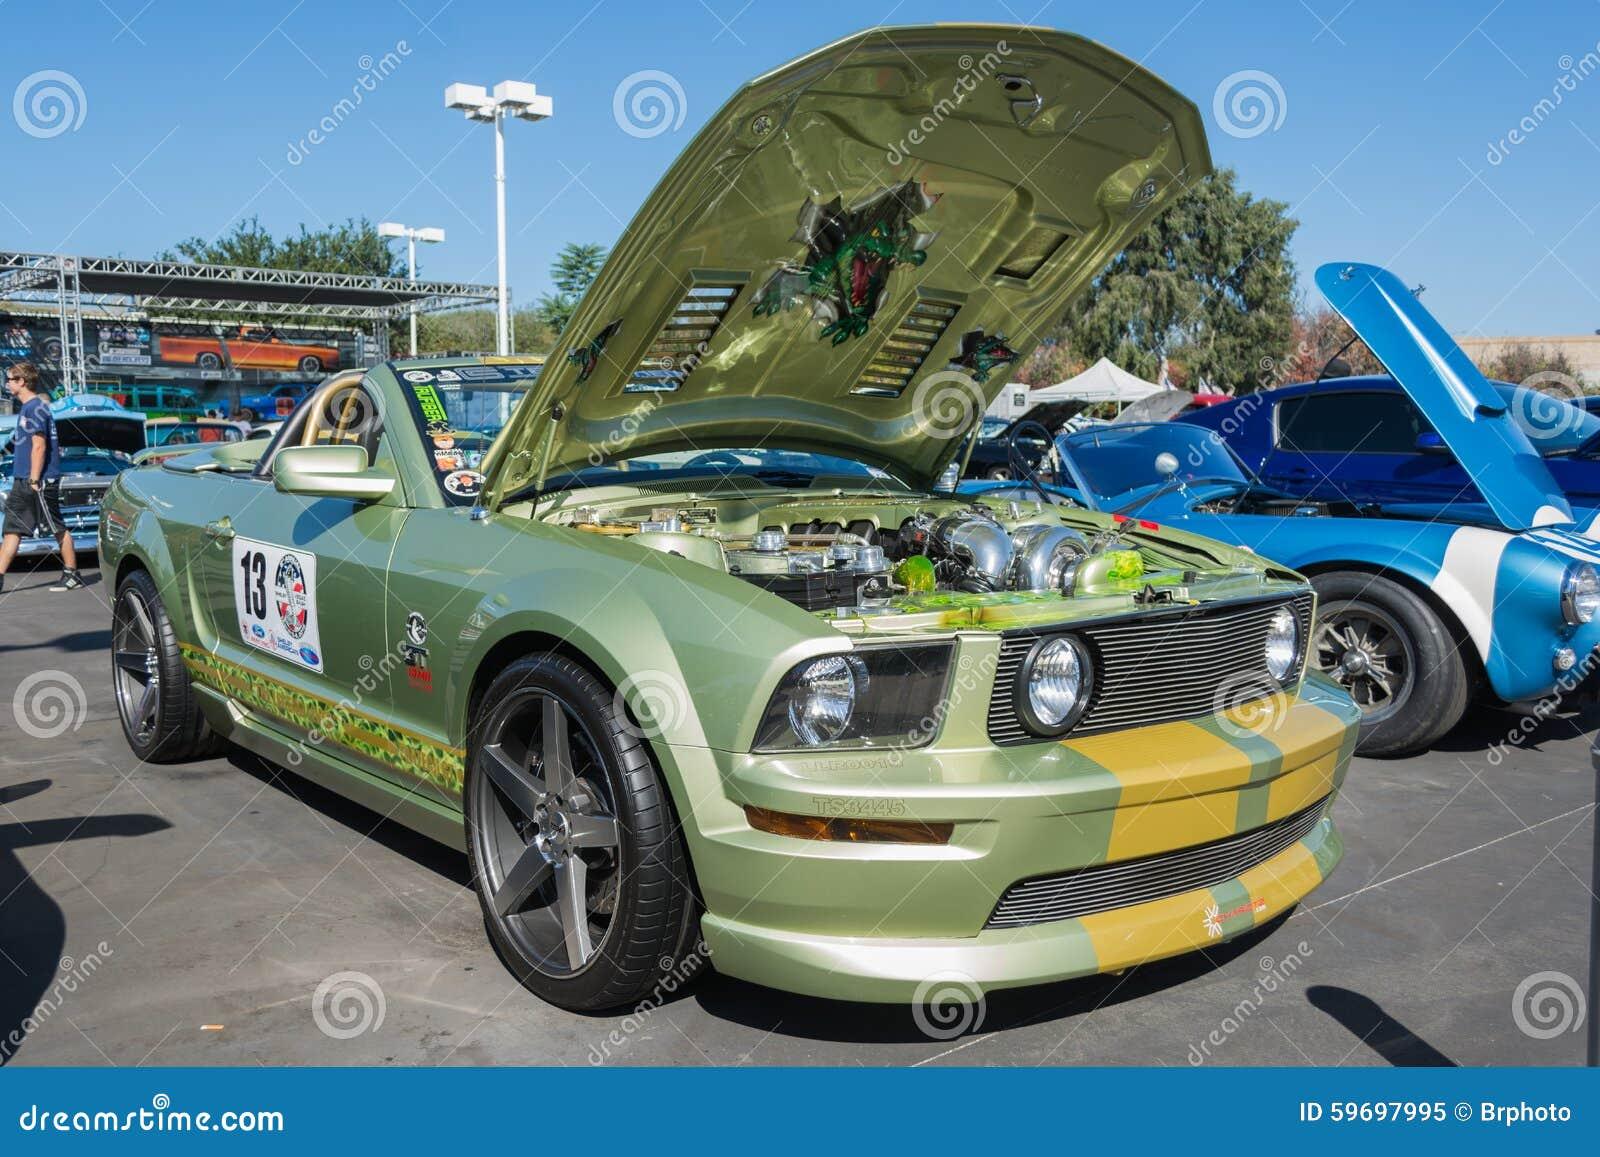 Ford Mustang Custom Editorial Image Image 59697995